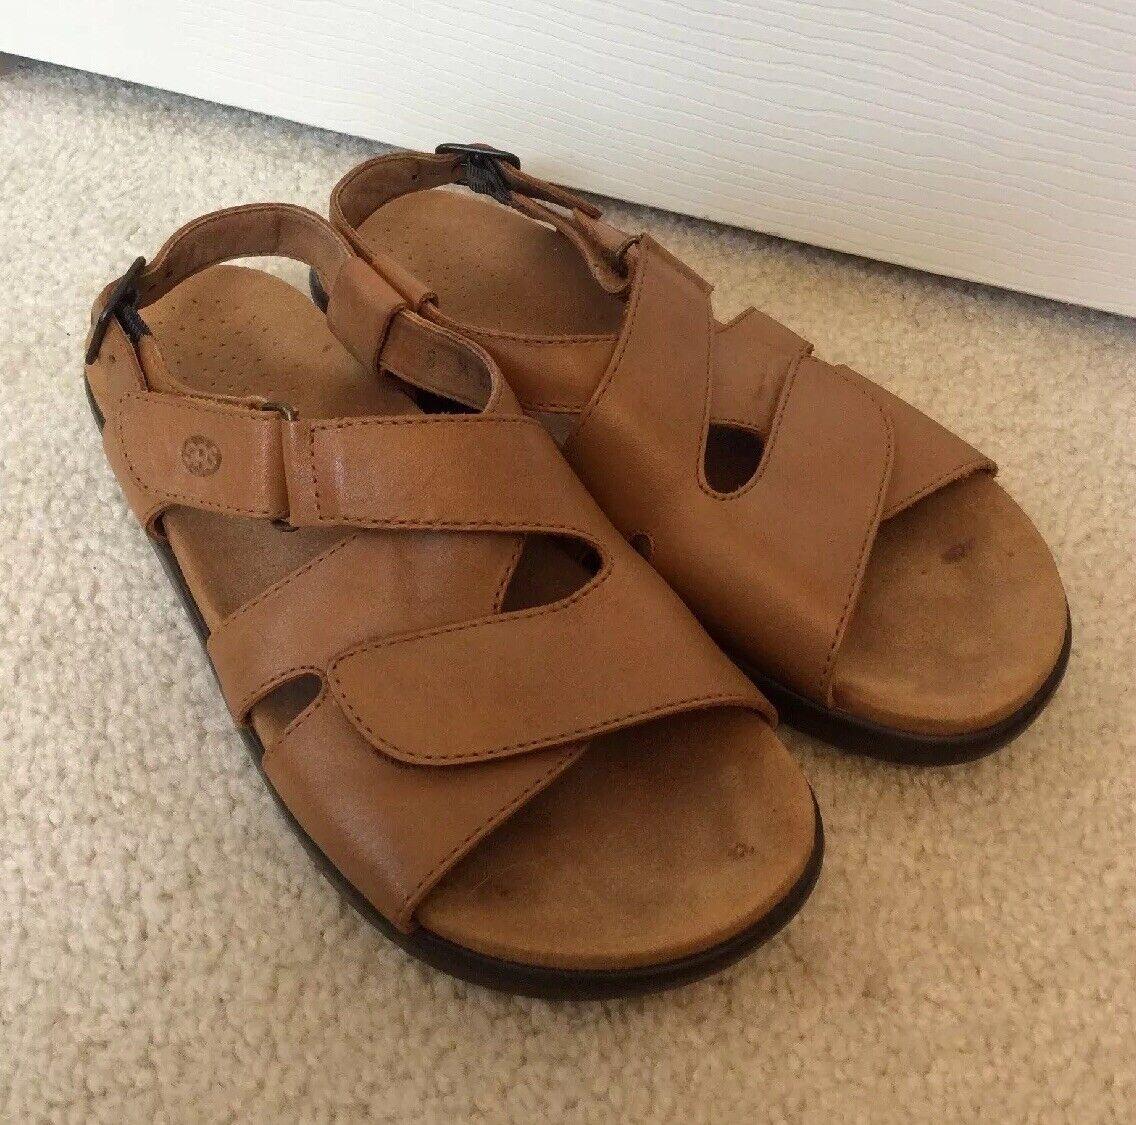 Women's SAS Ovation Leather Sandals Sandals Sandals Light Brown Adjustable Straps Size 8 M c393bb